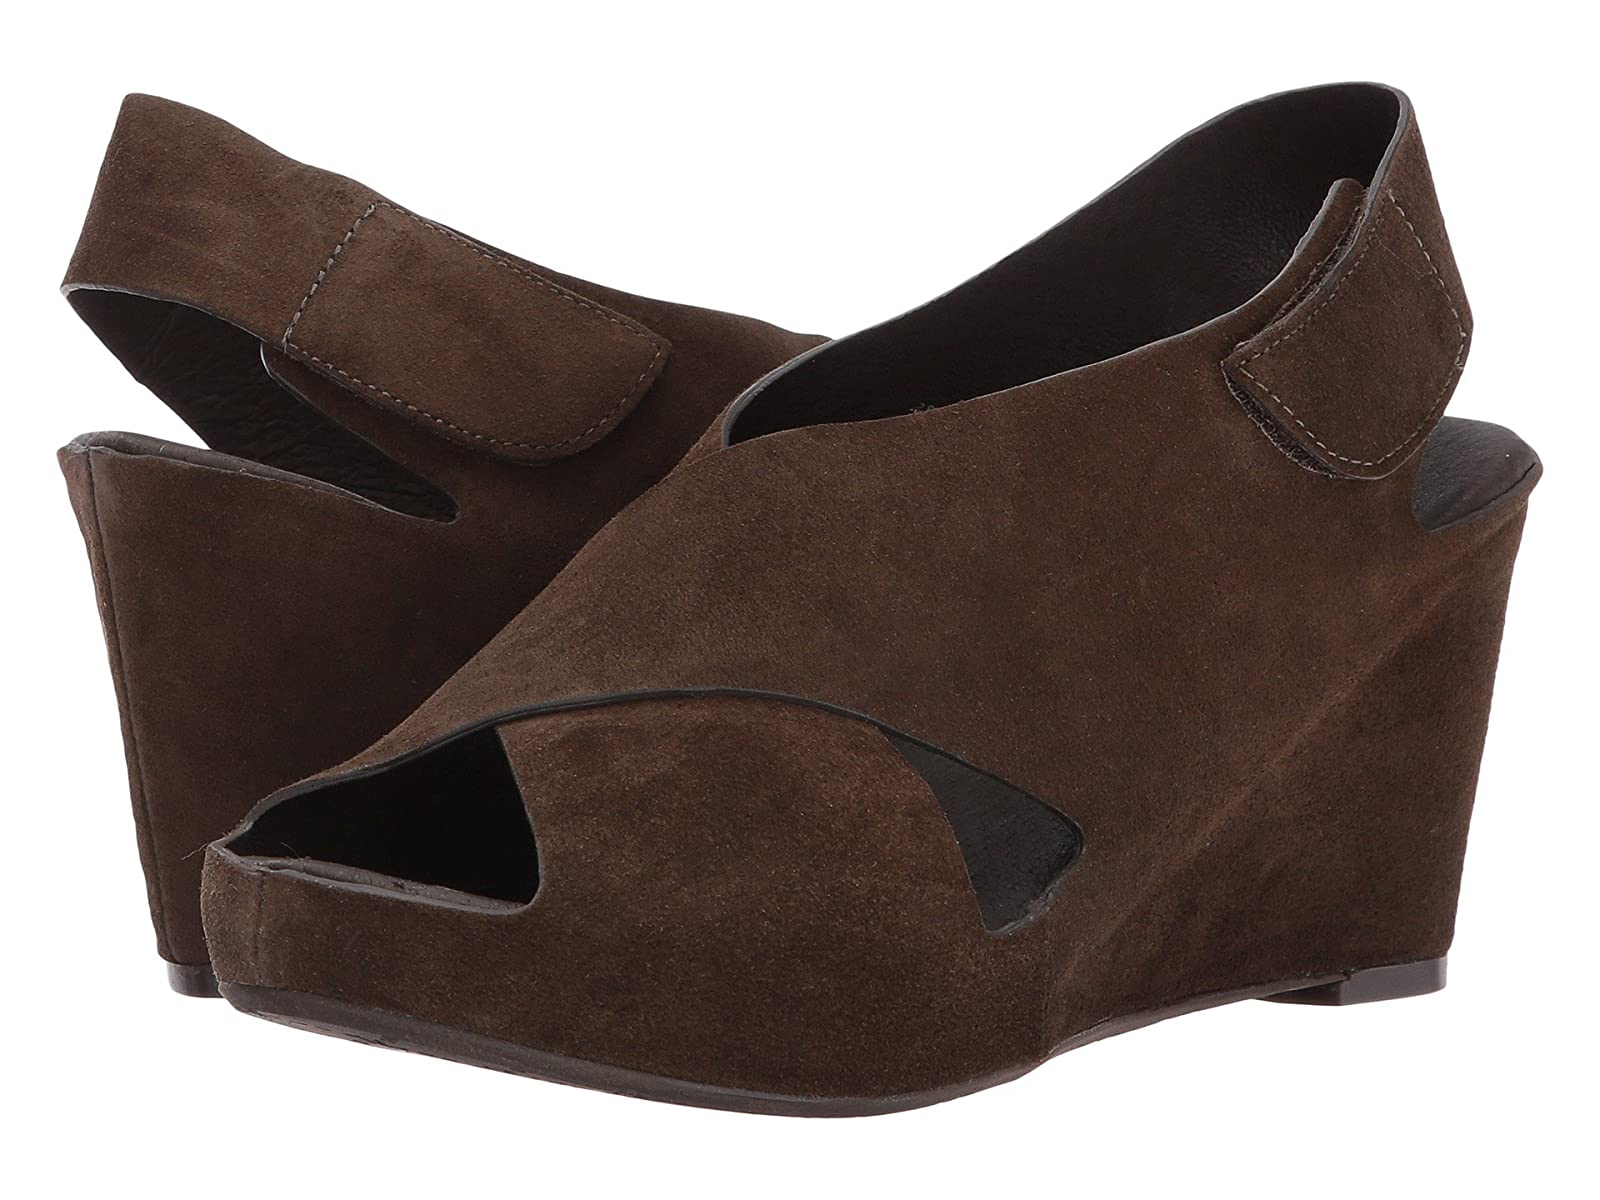 Johnston & Murphy ToriCheap and distinctive eye-catching shoes